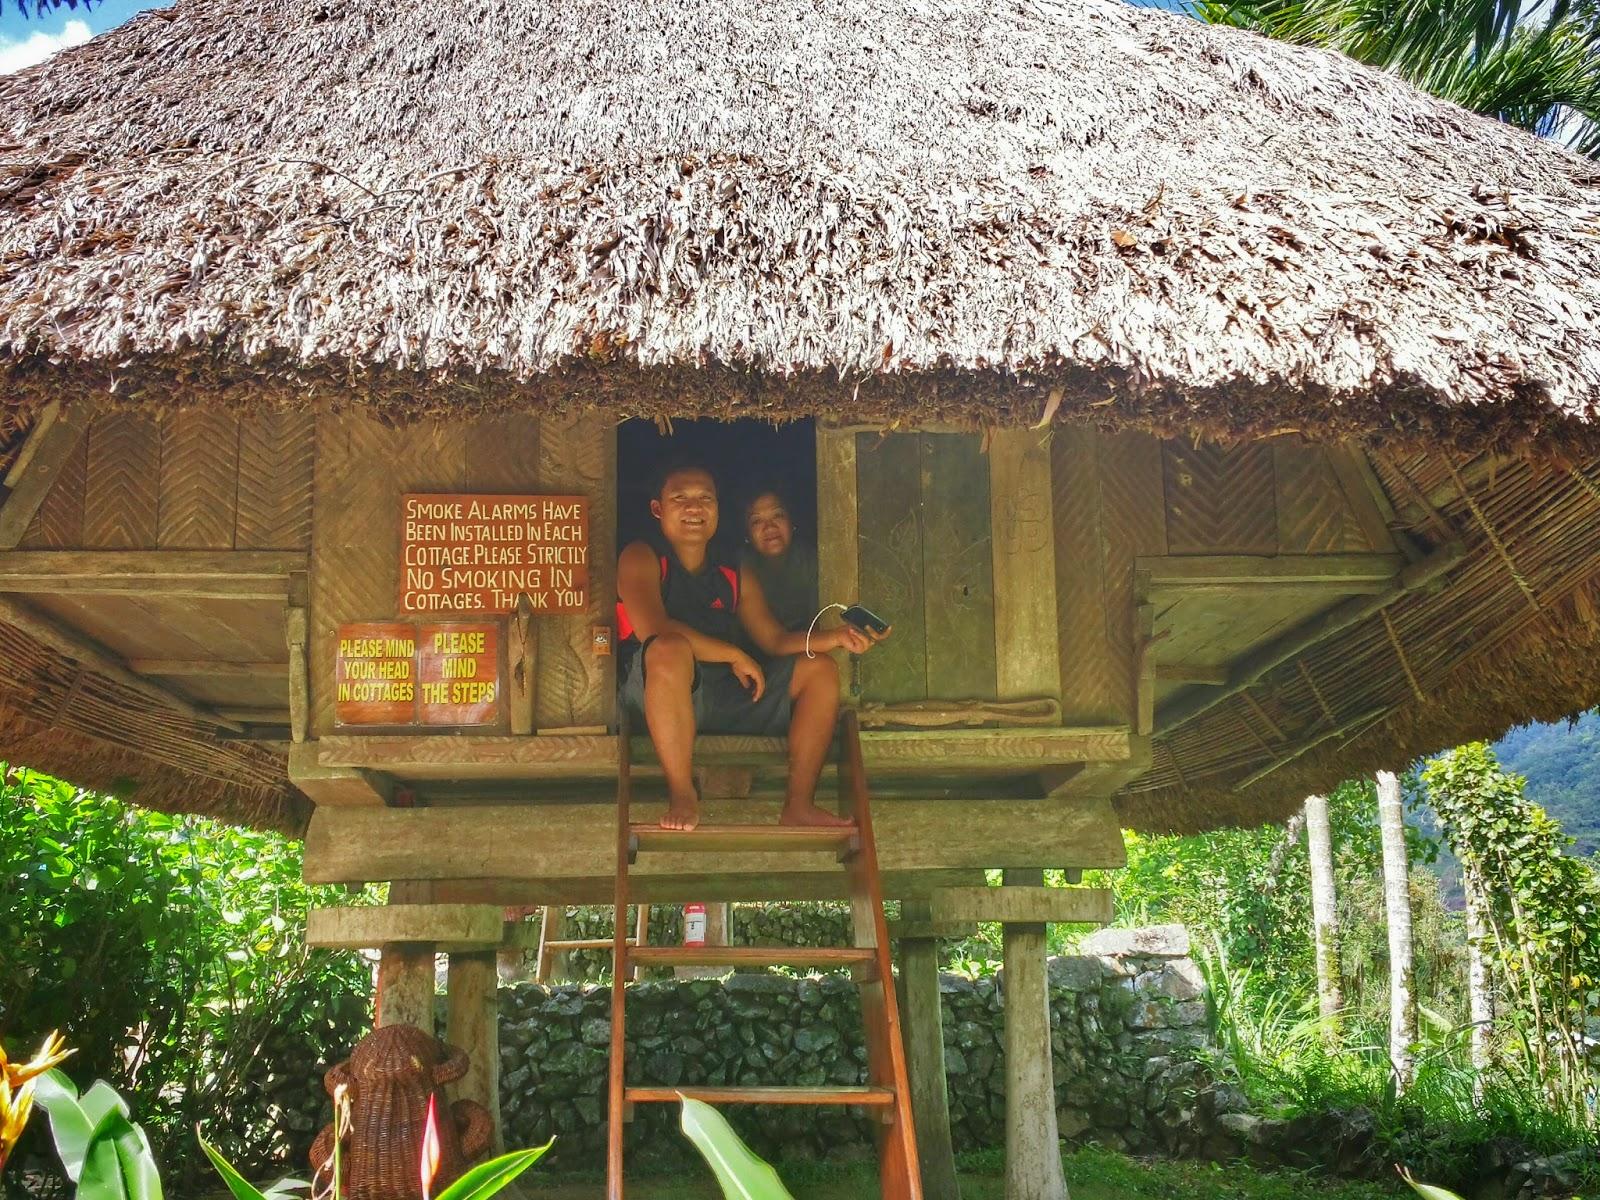 Native Village Inn Uhaj: Sleeping Inside a Native Ifugao ...